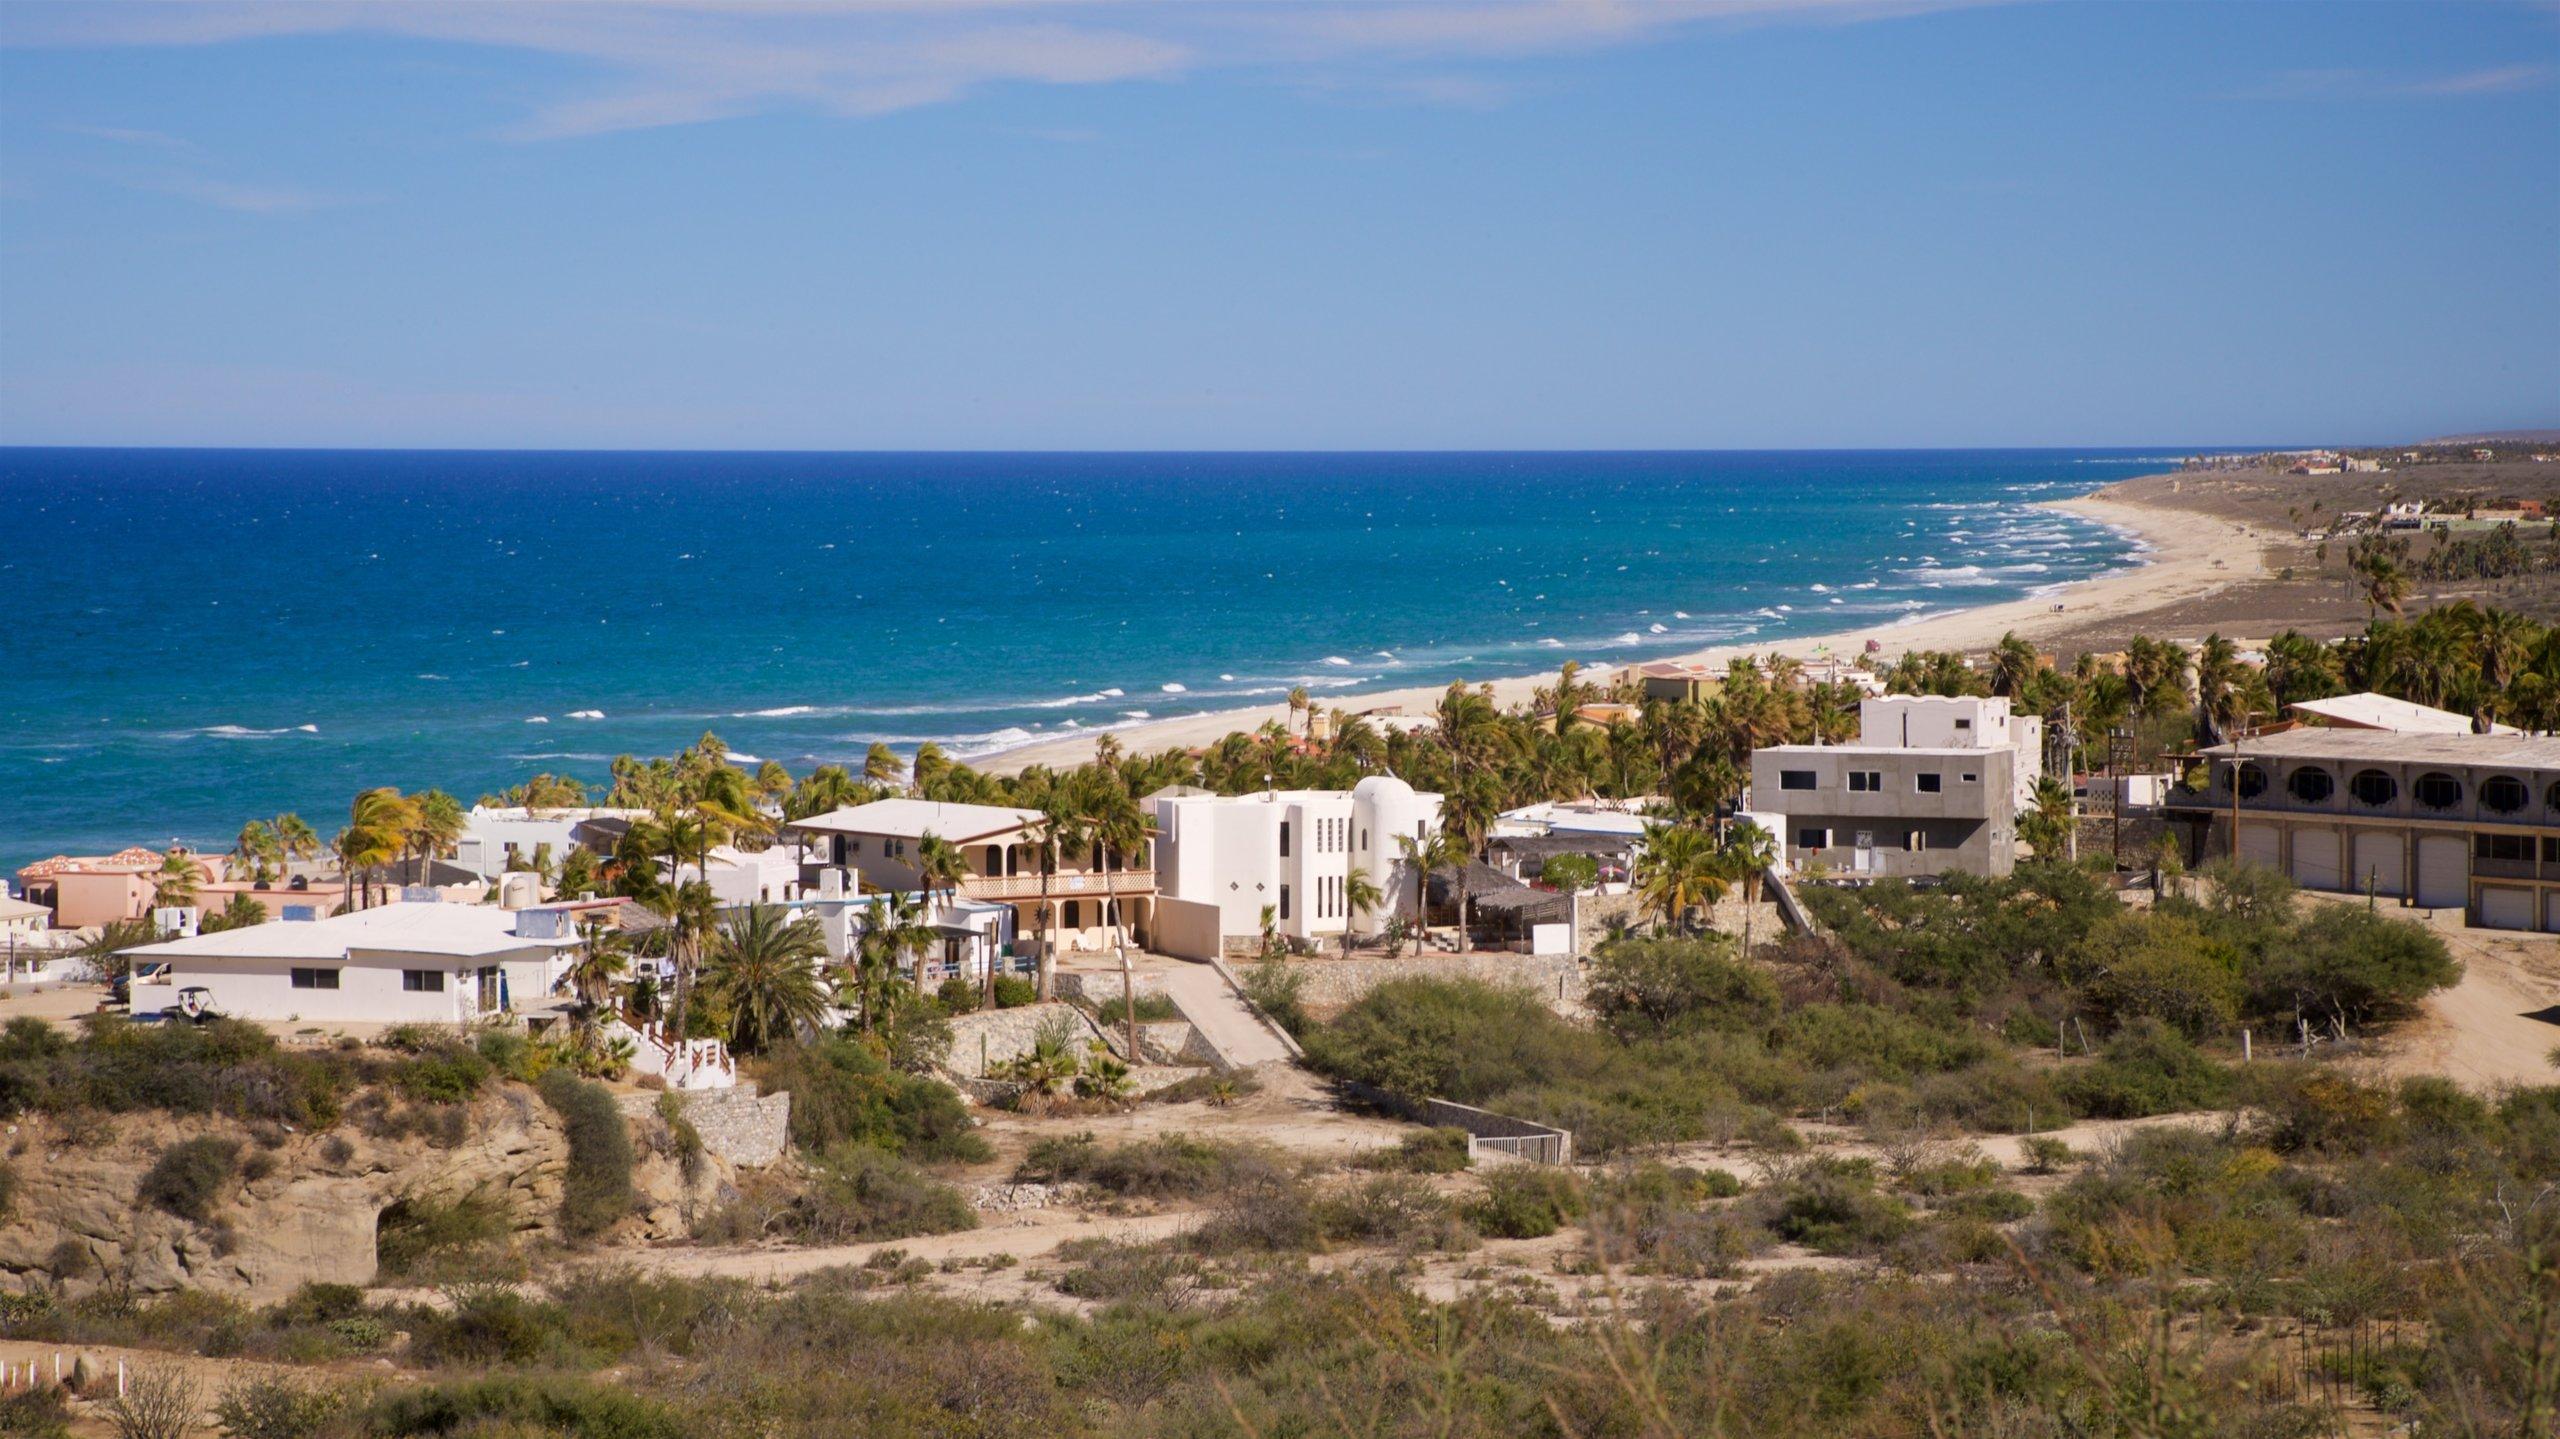 Buenavista, Baja California Sur, Mexico